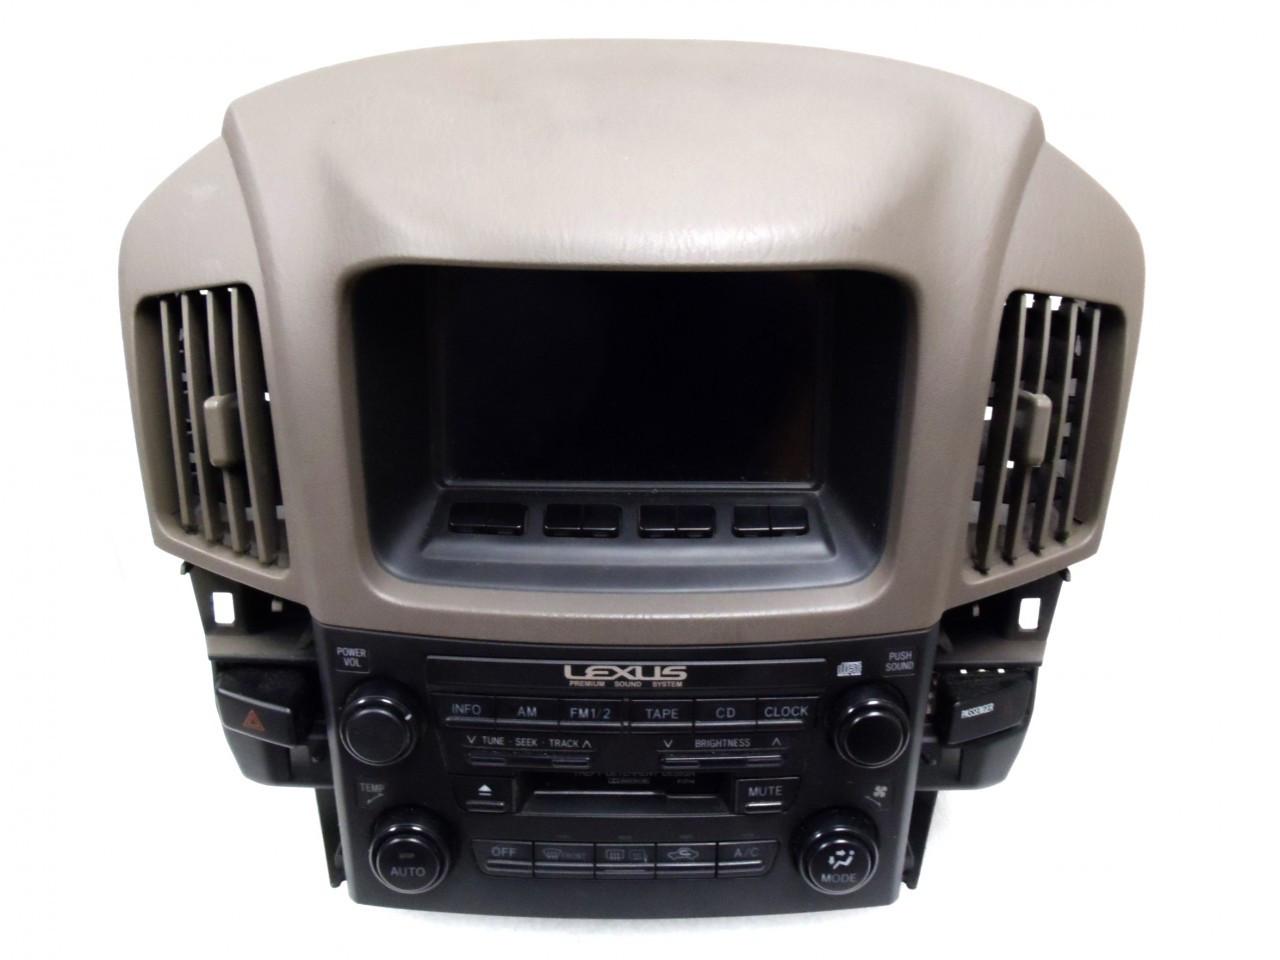 LEXUS RX300 Premium Sound System Radio Stereo Tape Player Climate Controls  P1714 1999 2000 2001 2002 2003